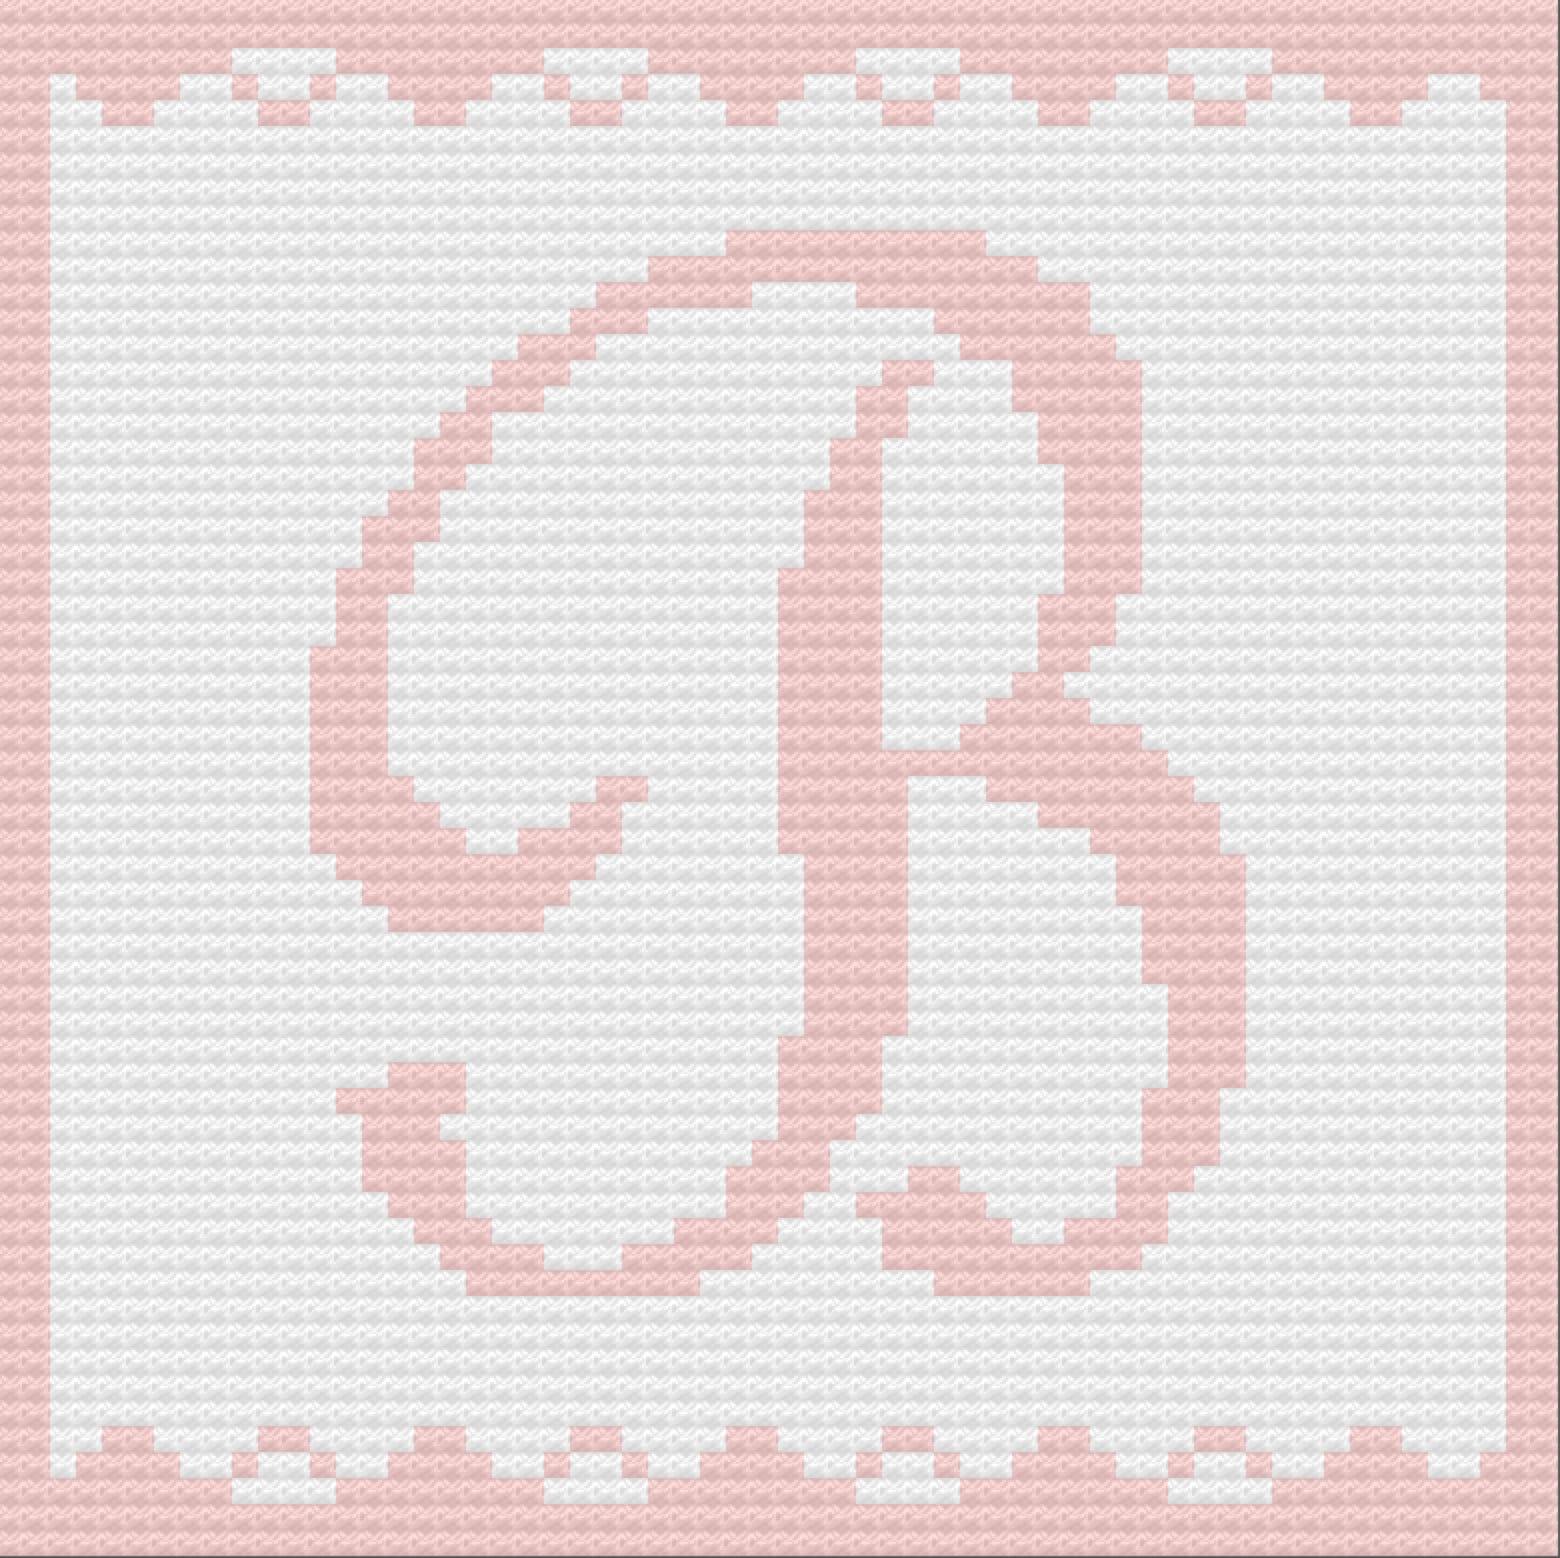 Letter B Baby Blanket C2c Crochet Pattern Written Row Counts C2c Graphs Corner To Corner Crochet Pattern C2c Graph